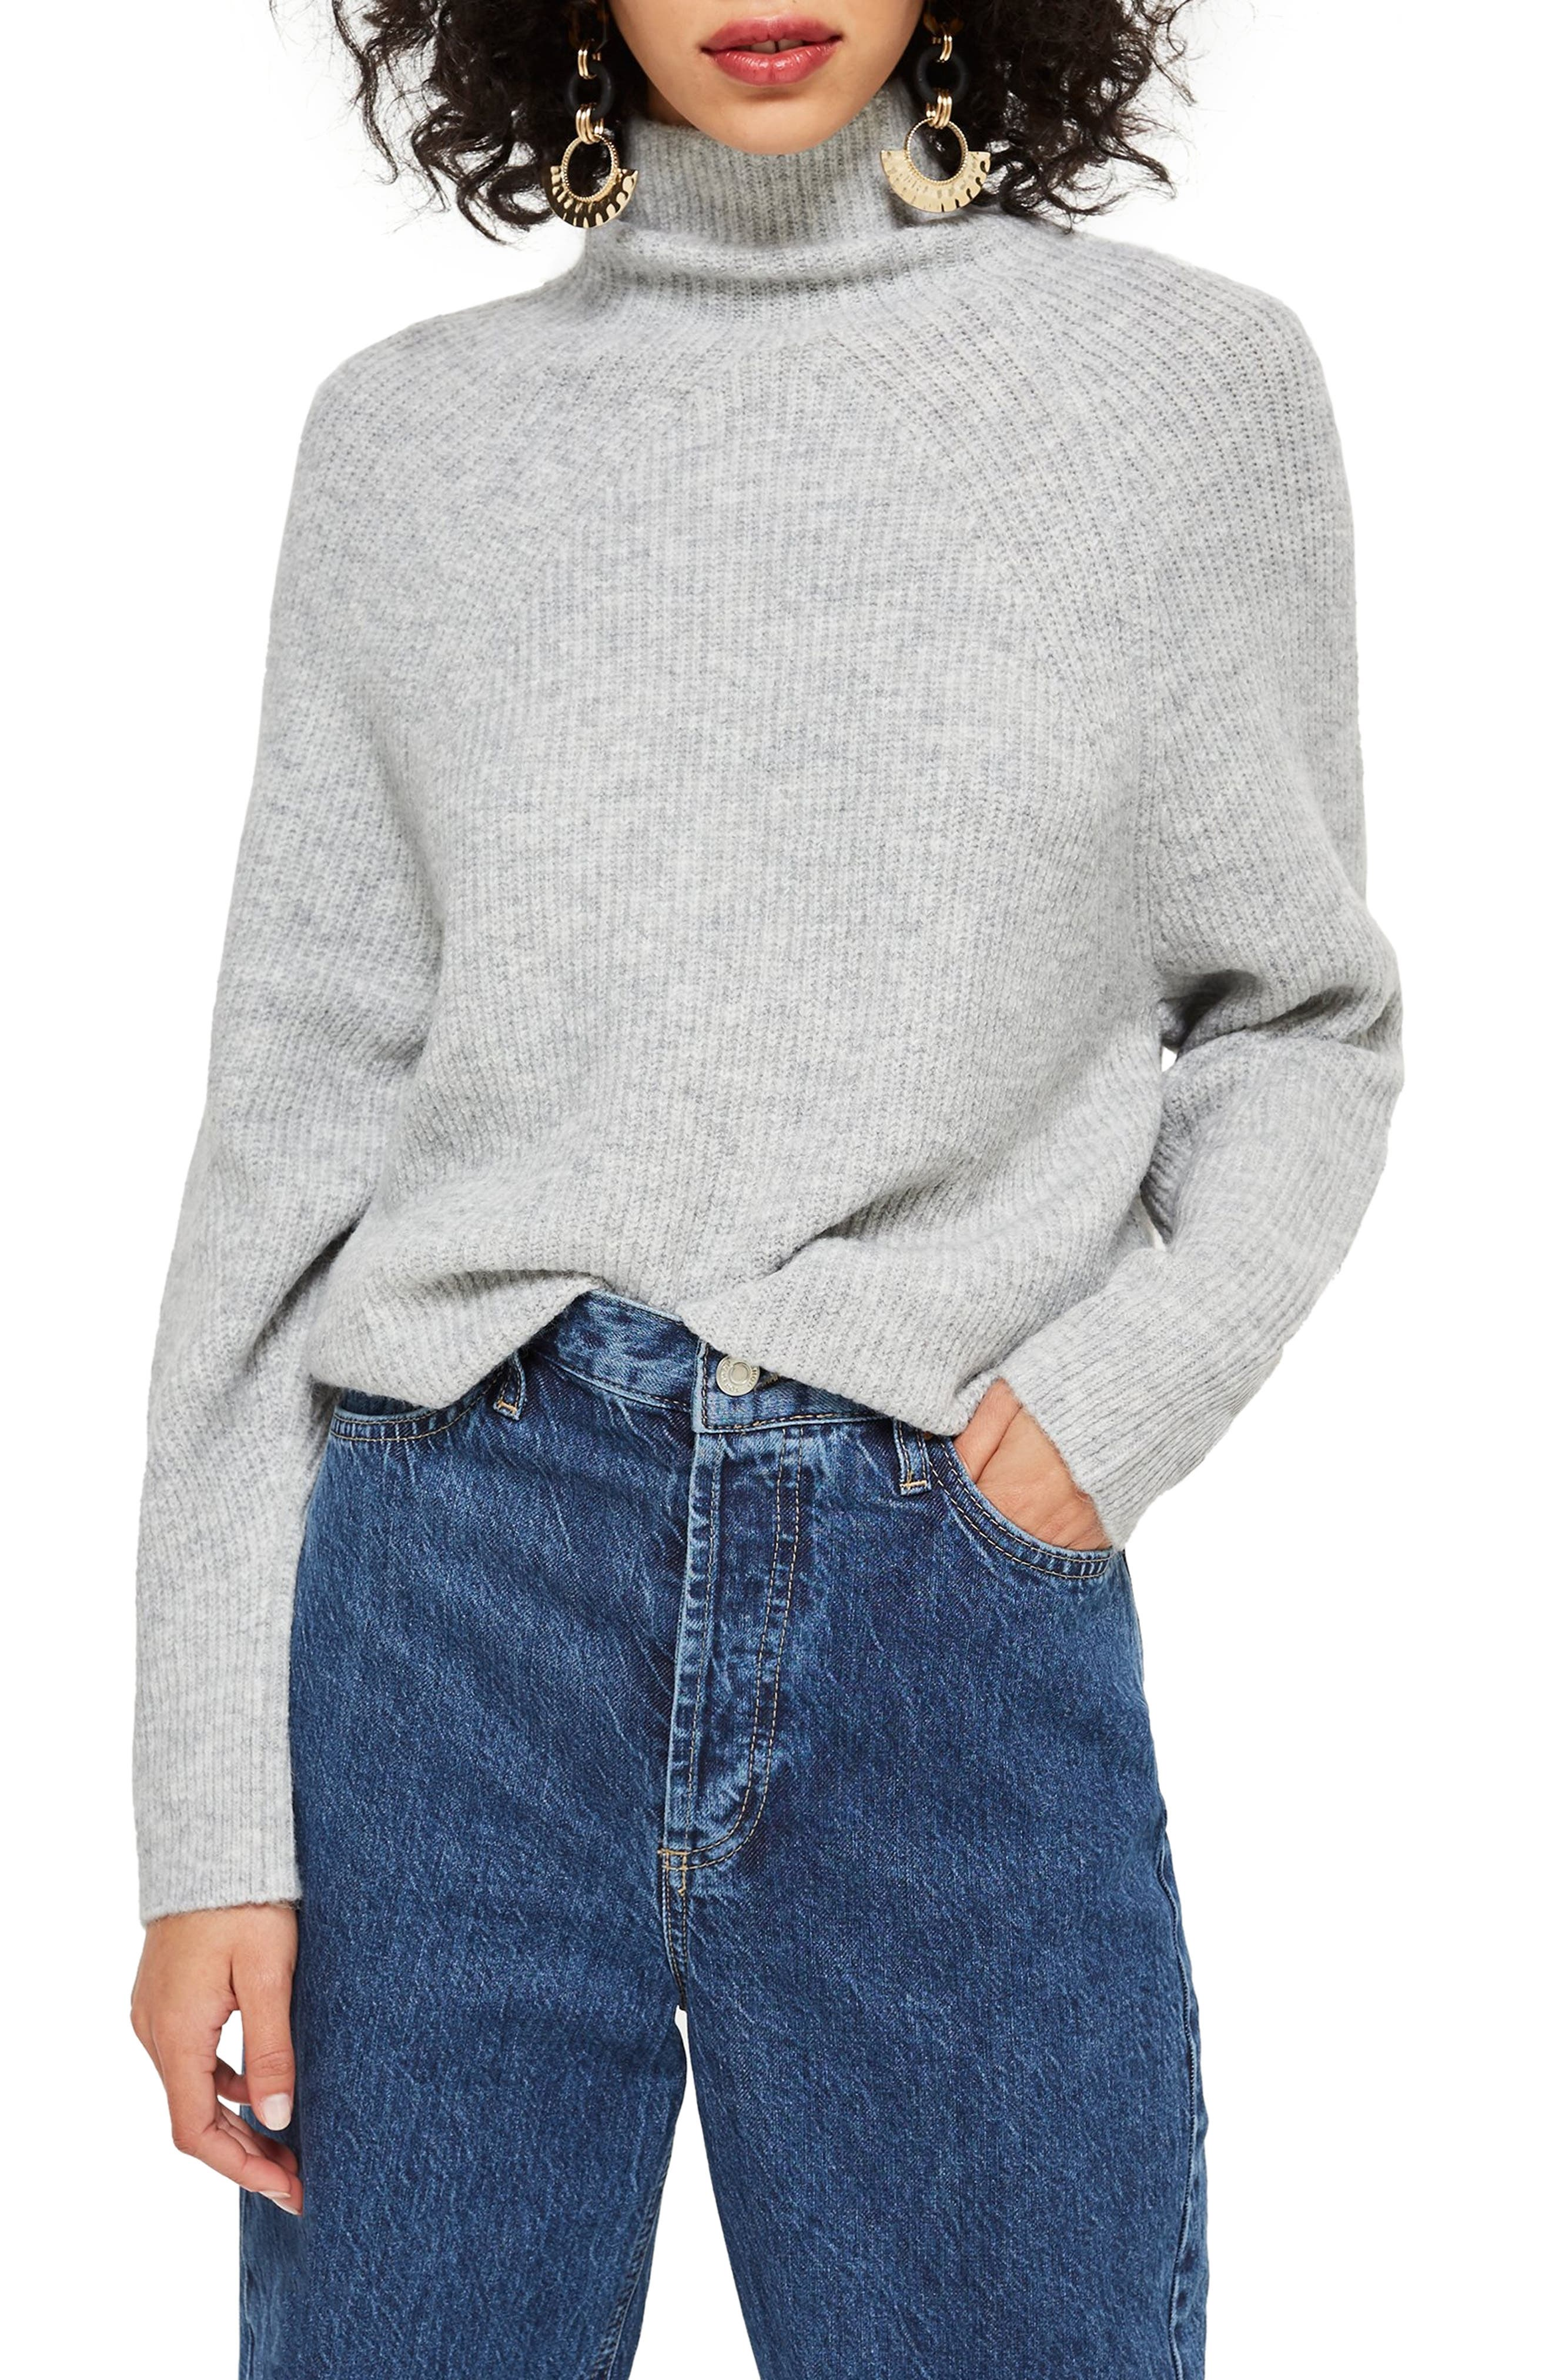 TOPSHOP, Raglan Turtleneck Neck Sweater, Main thumbnail 1, color, GREY MARL